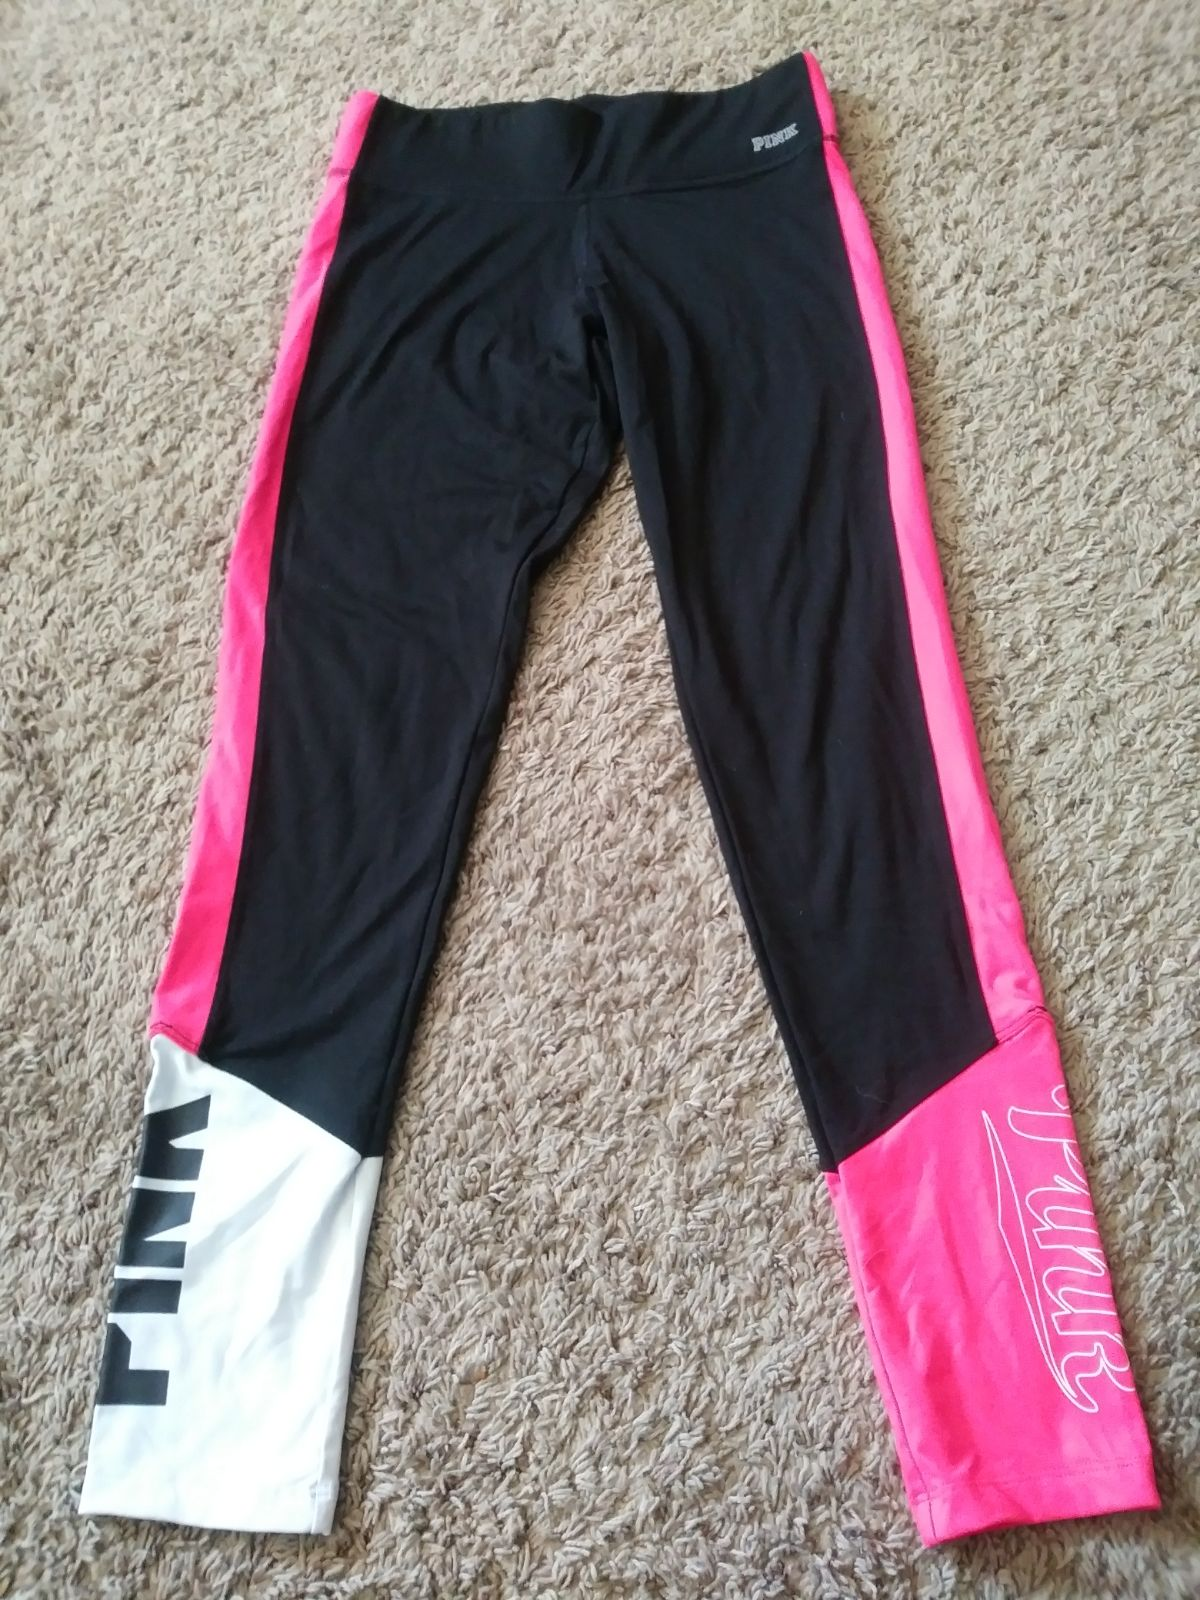 PINK ultimate yoga pants